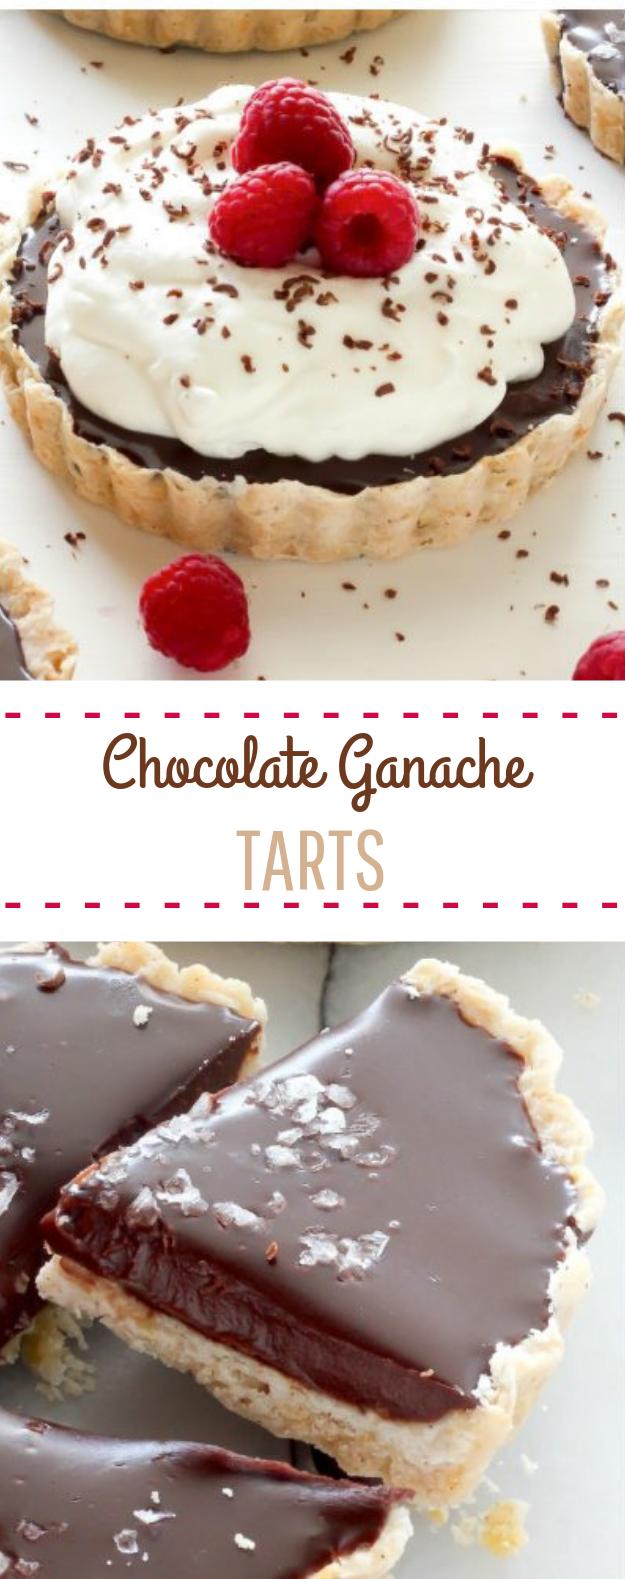 Chocolate Ganache Tarts #tart #dessert